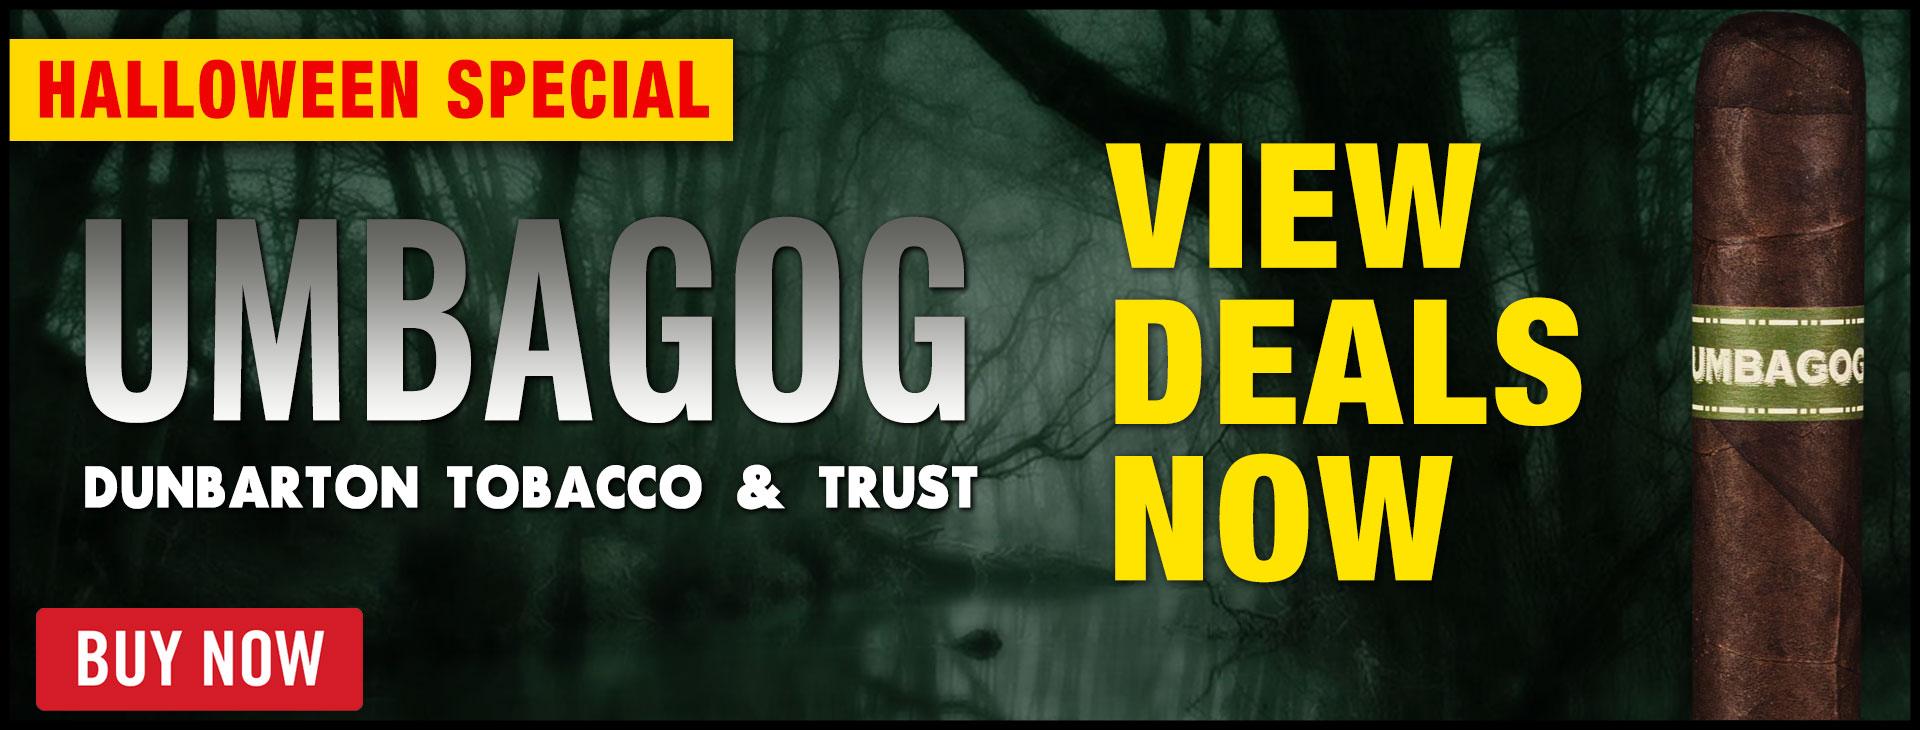 umbagog-2020-banner.jpg